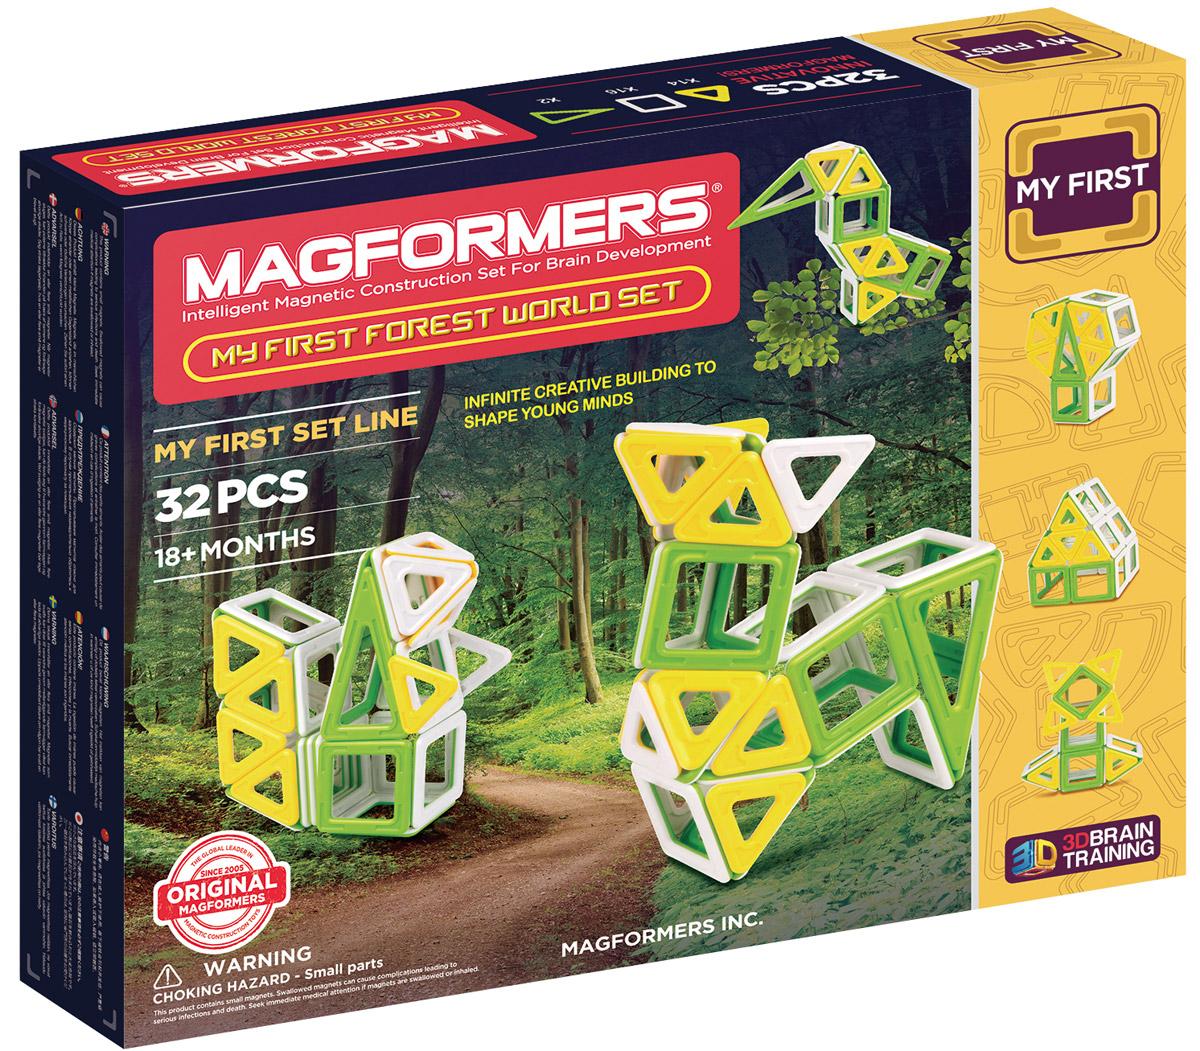 Magformers Магнитный конструктор My First Forest World Set magformers my first magformers 30